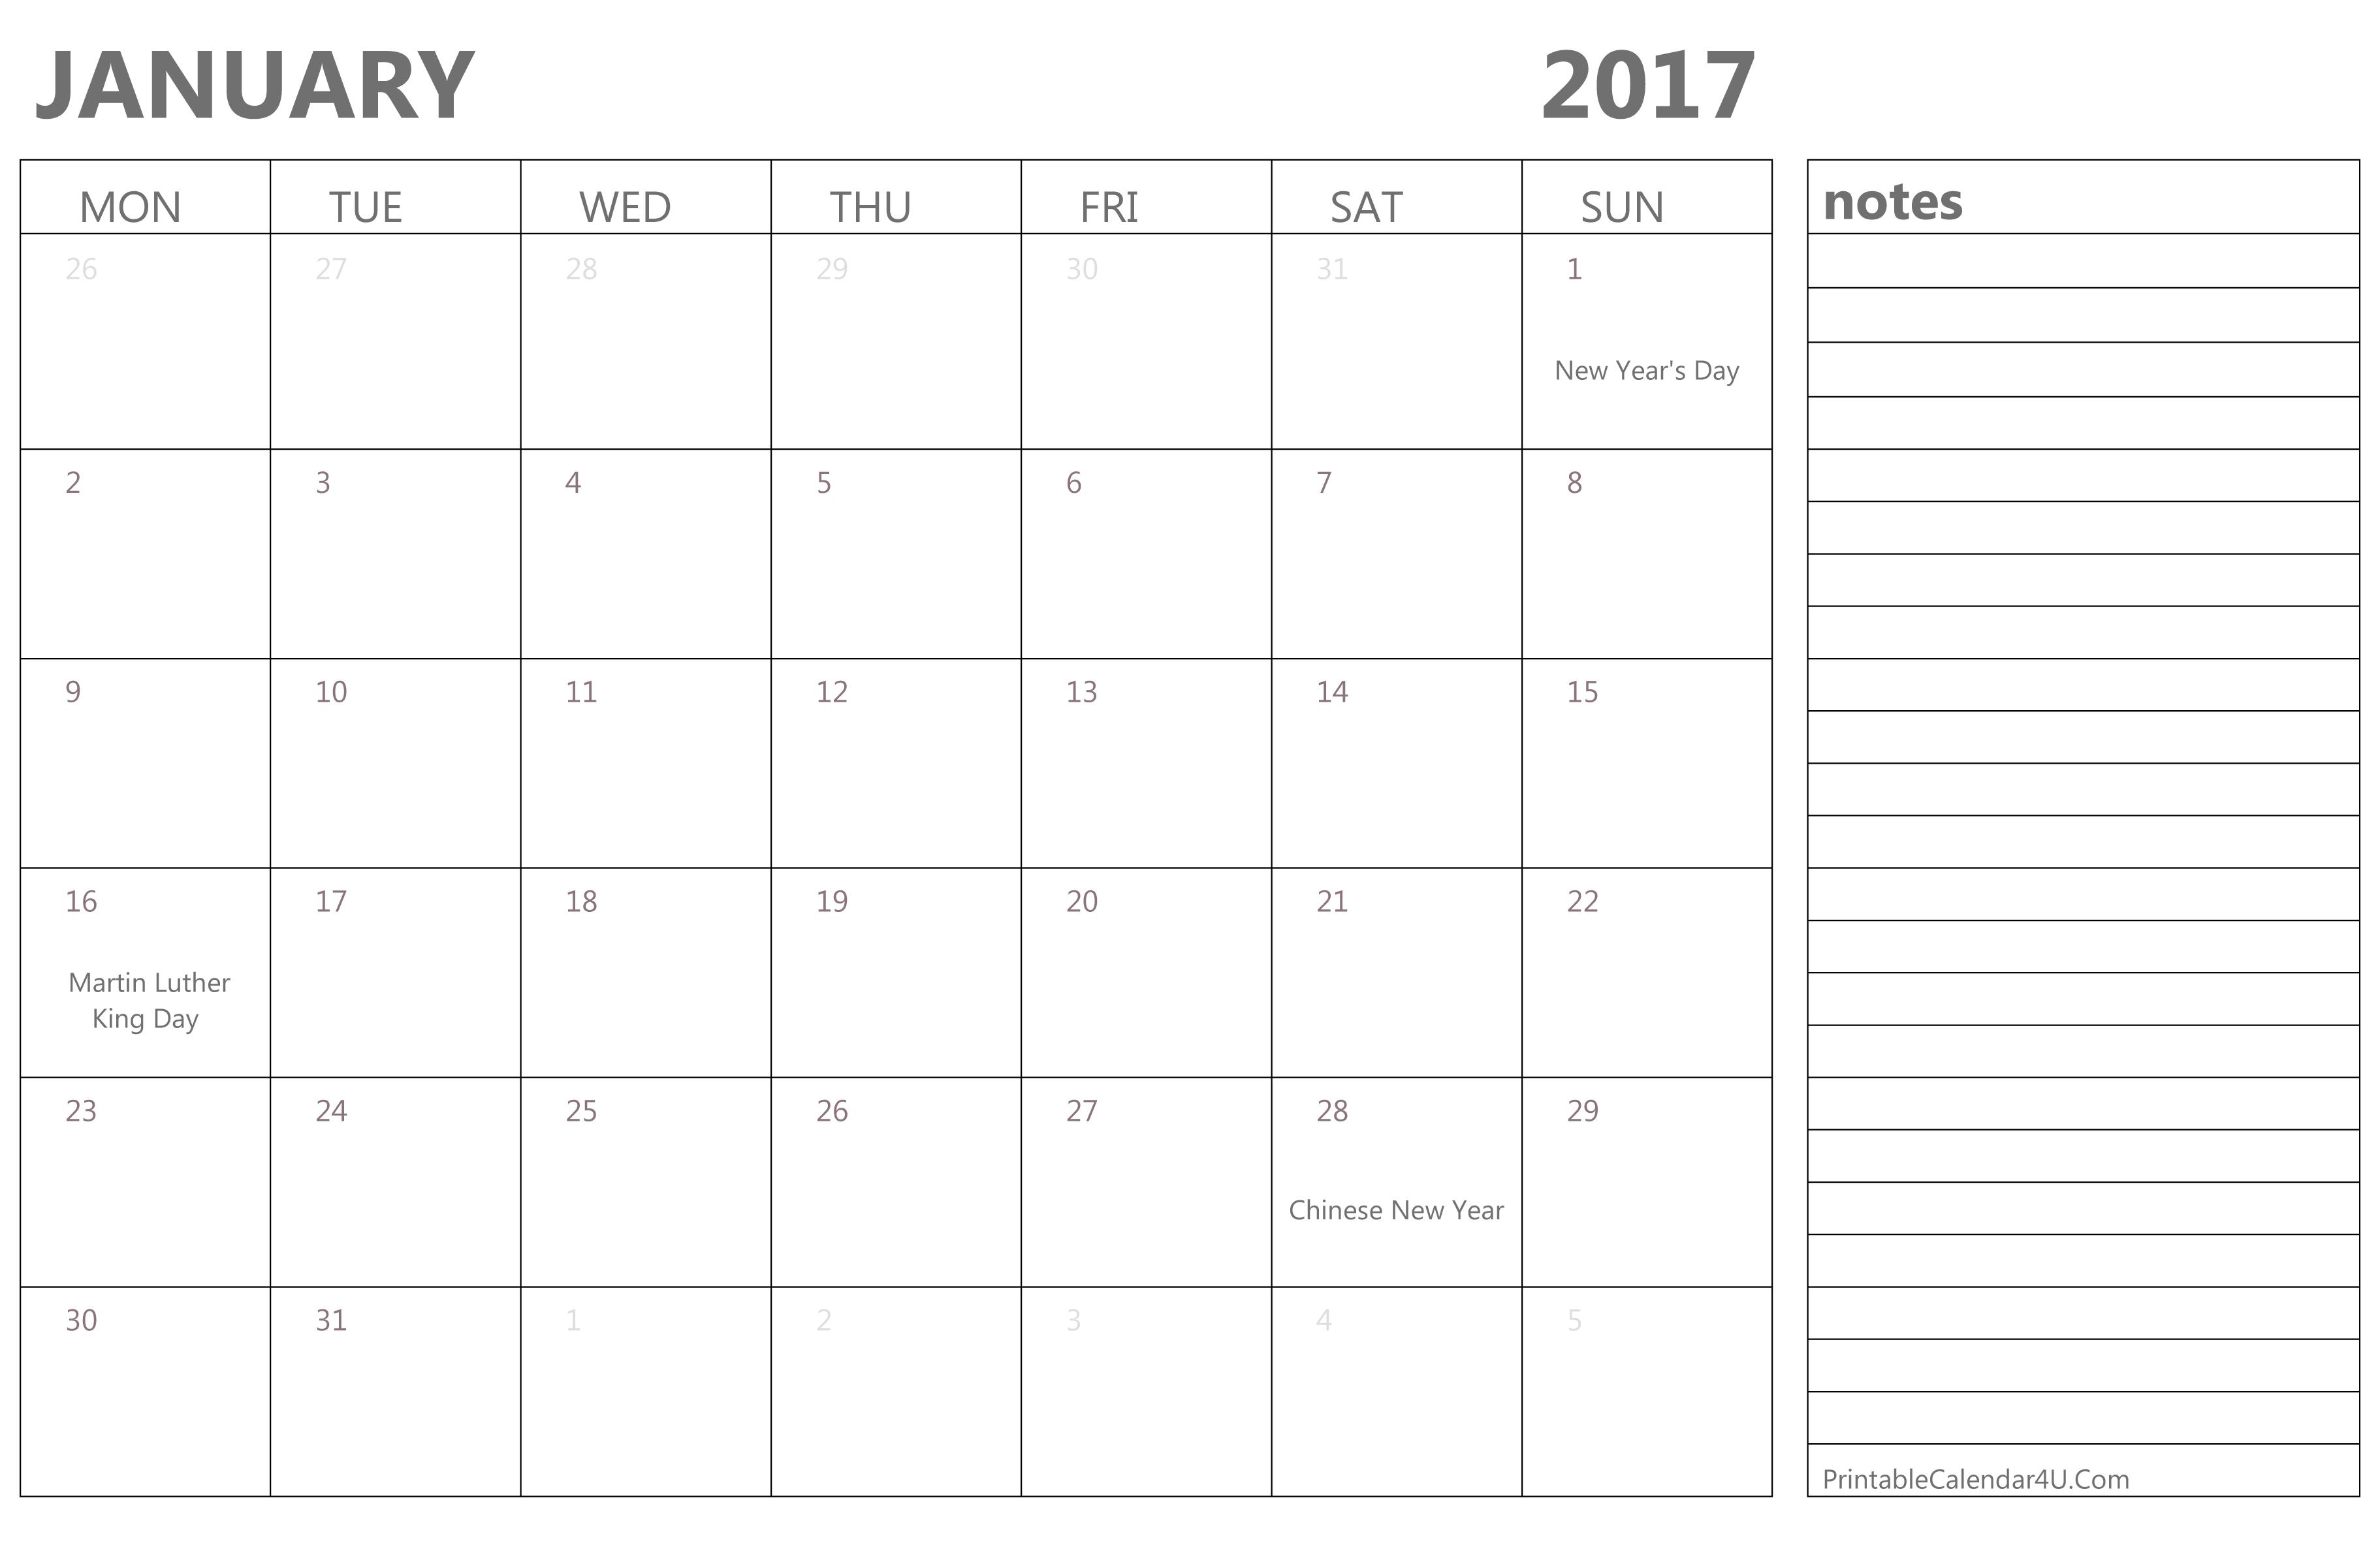 January Calendar 2017 With Holidays : Best january calendar printable with holidays and